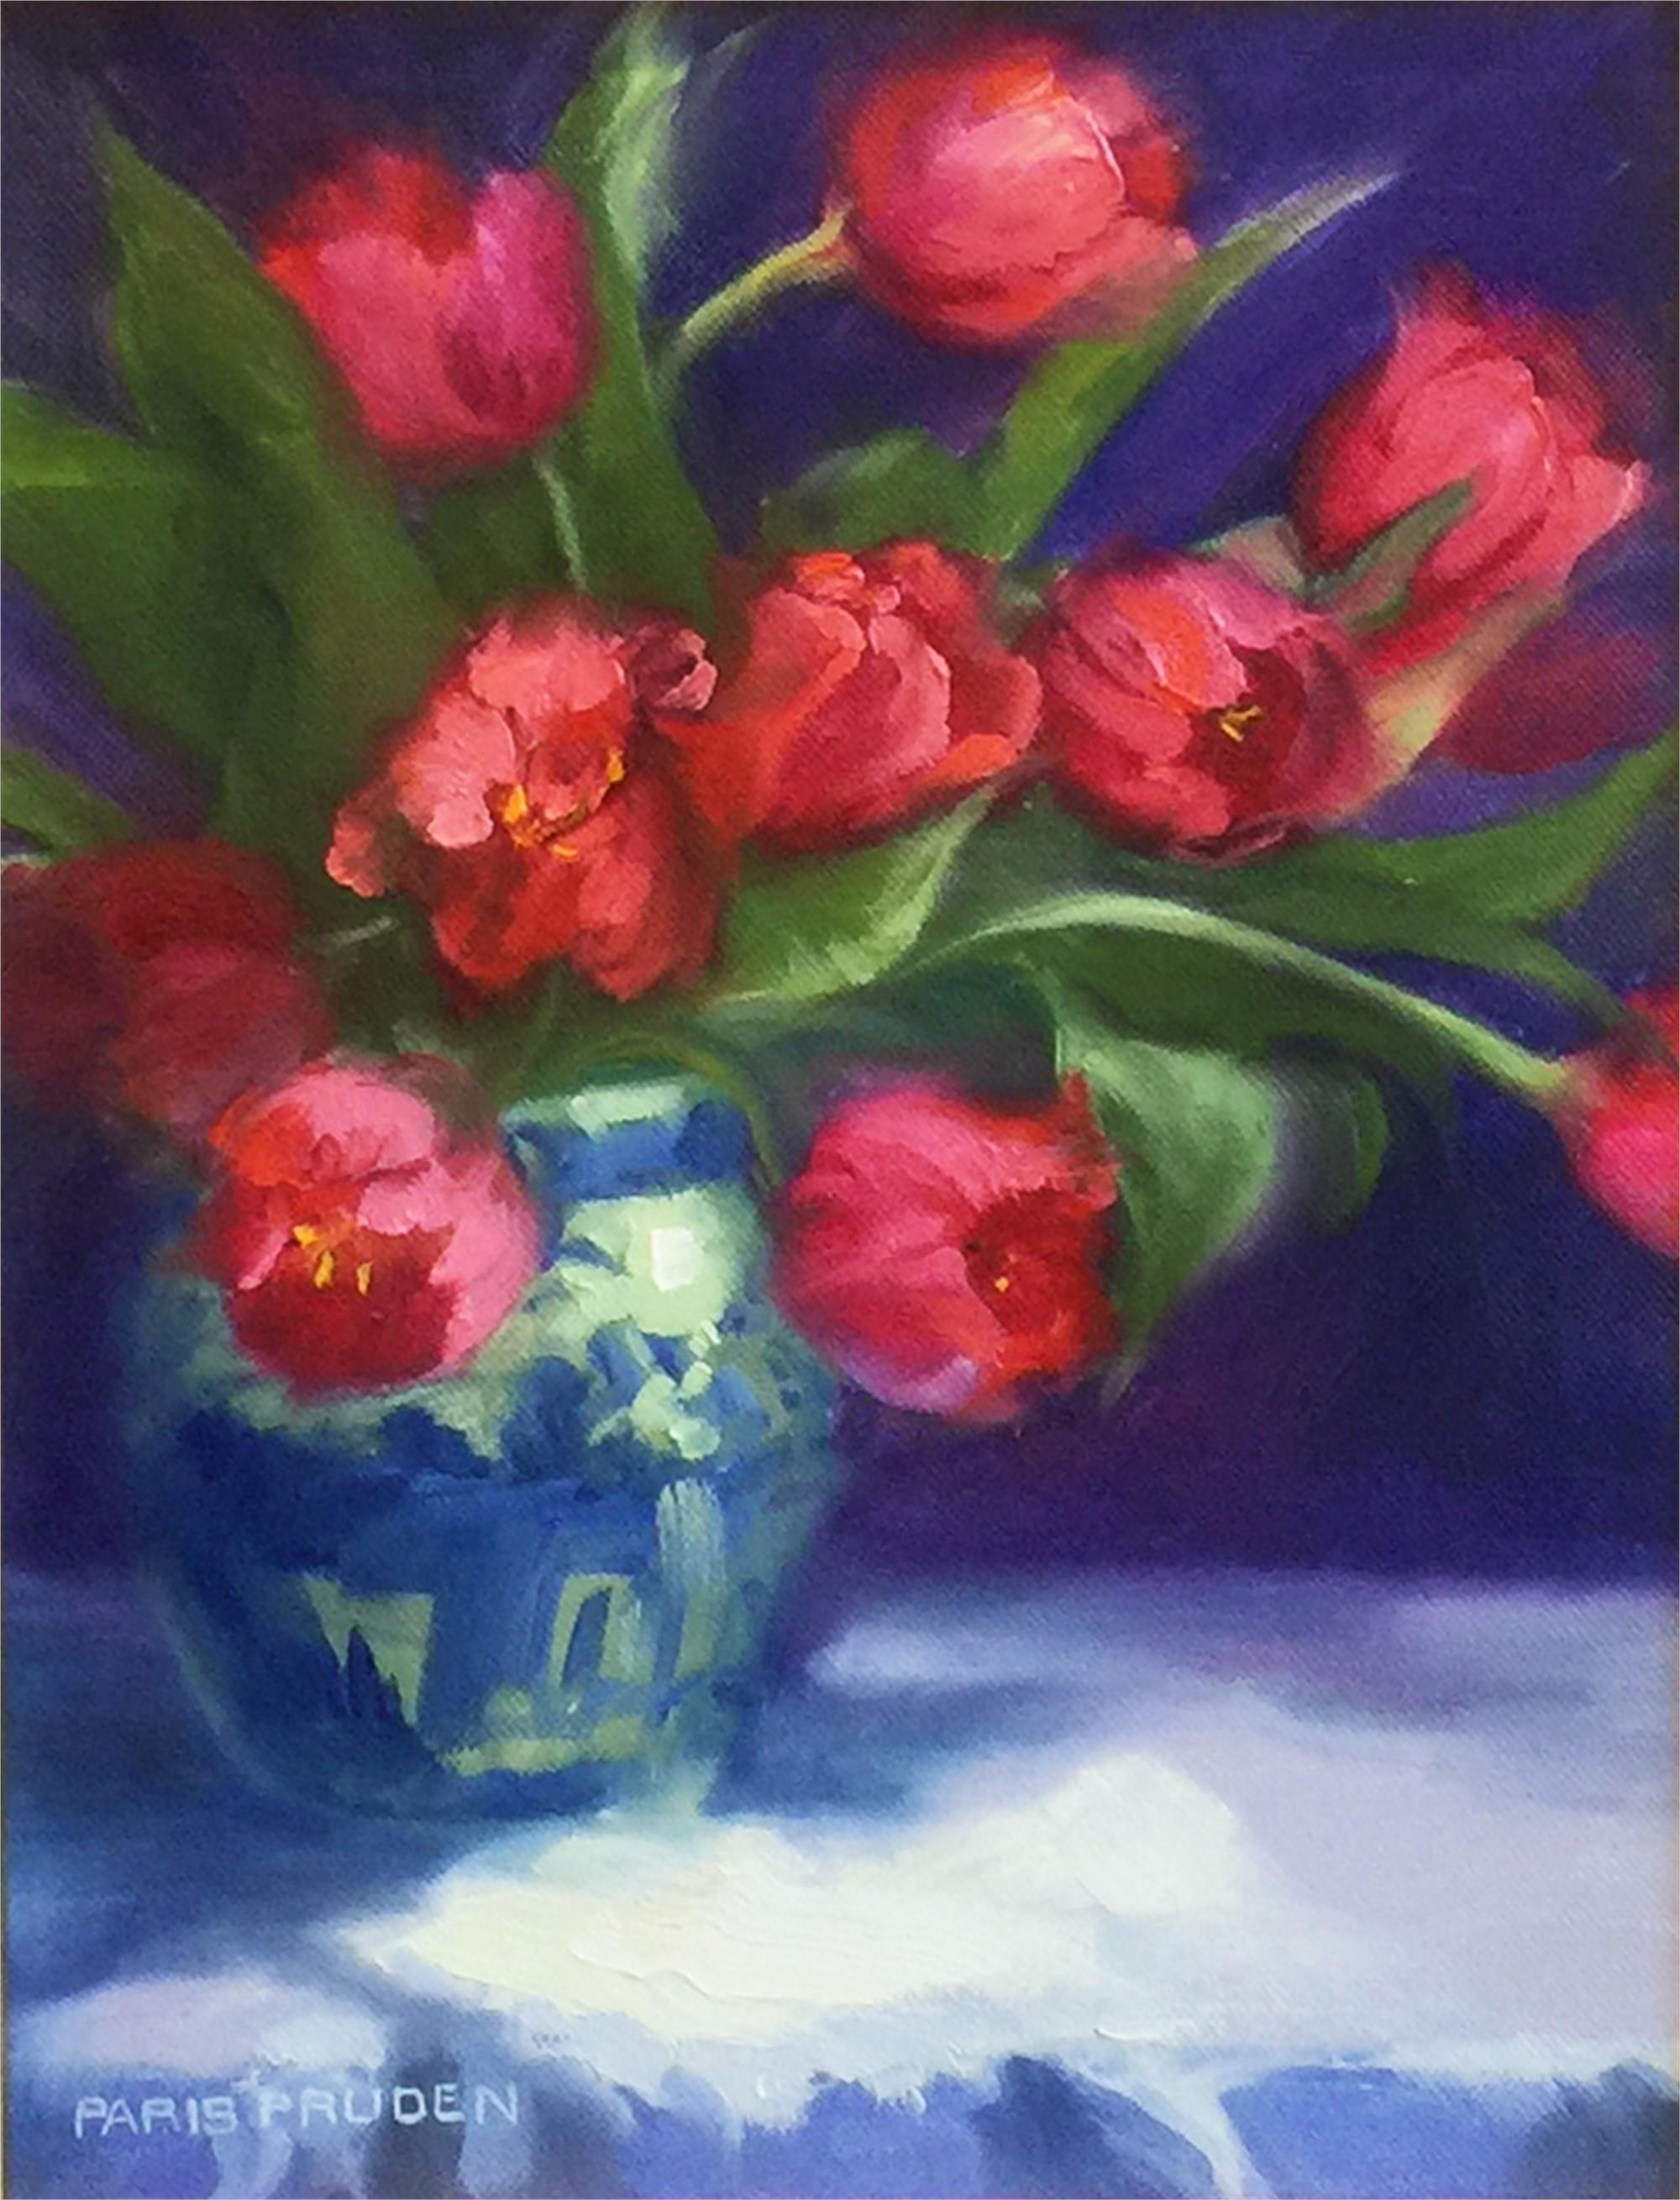 Tulips In Chinese Vase by Nancy Paris Pruden